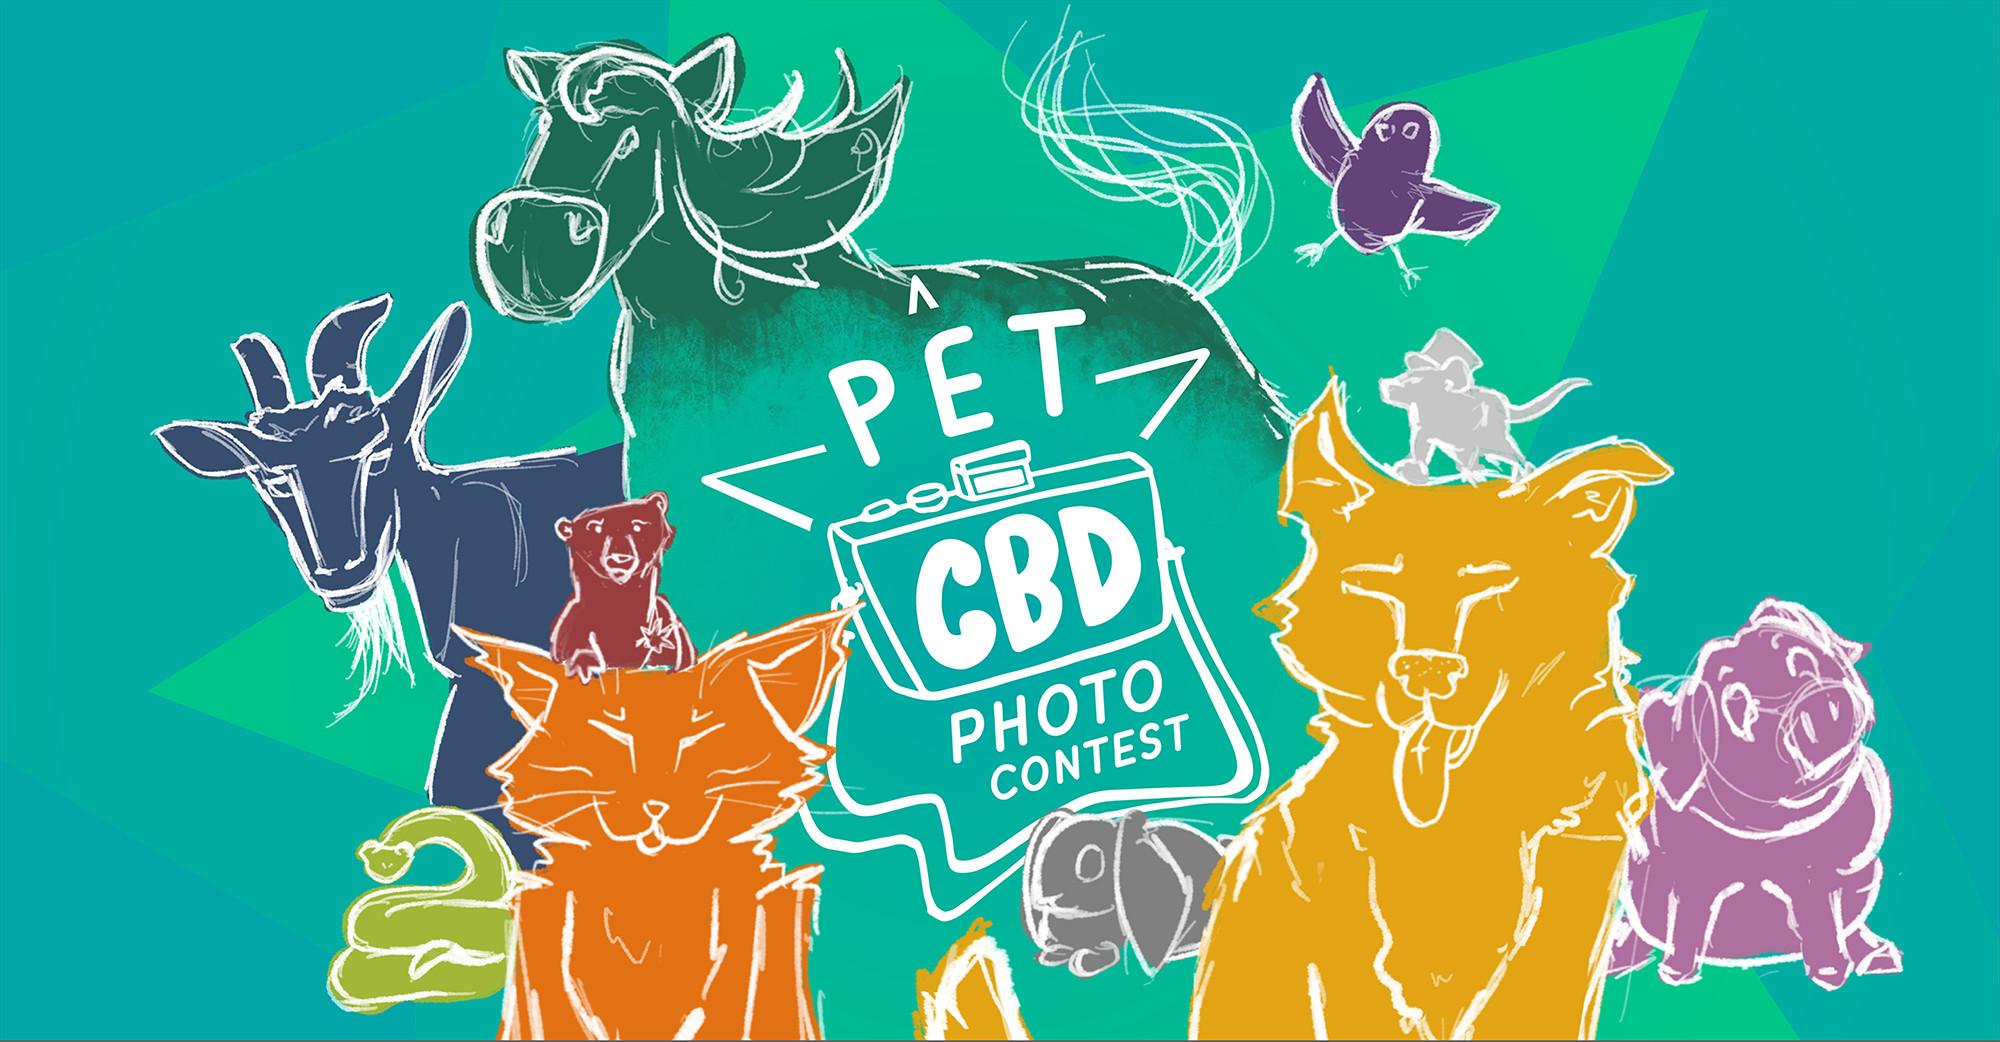 2021-PetCBD_PhotoContest-Entries_web-header